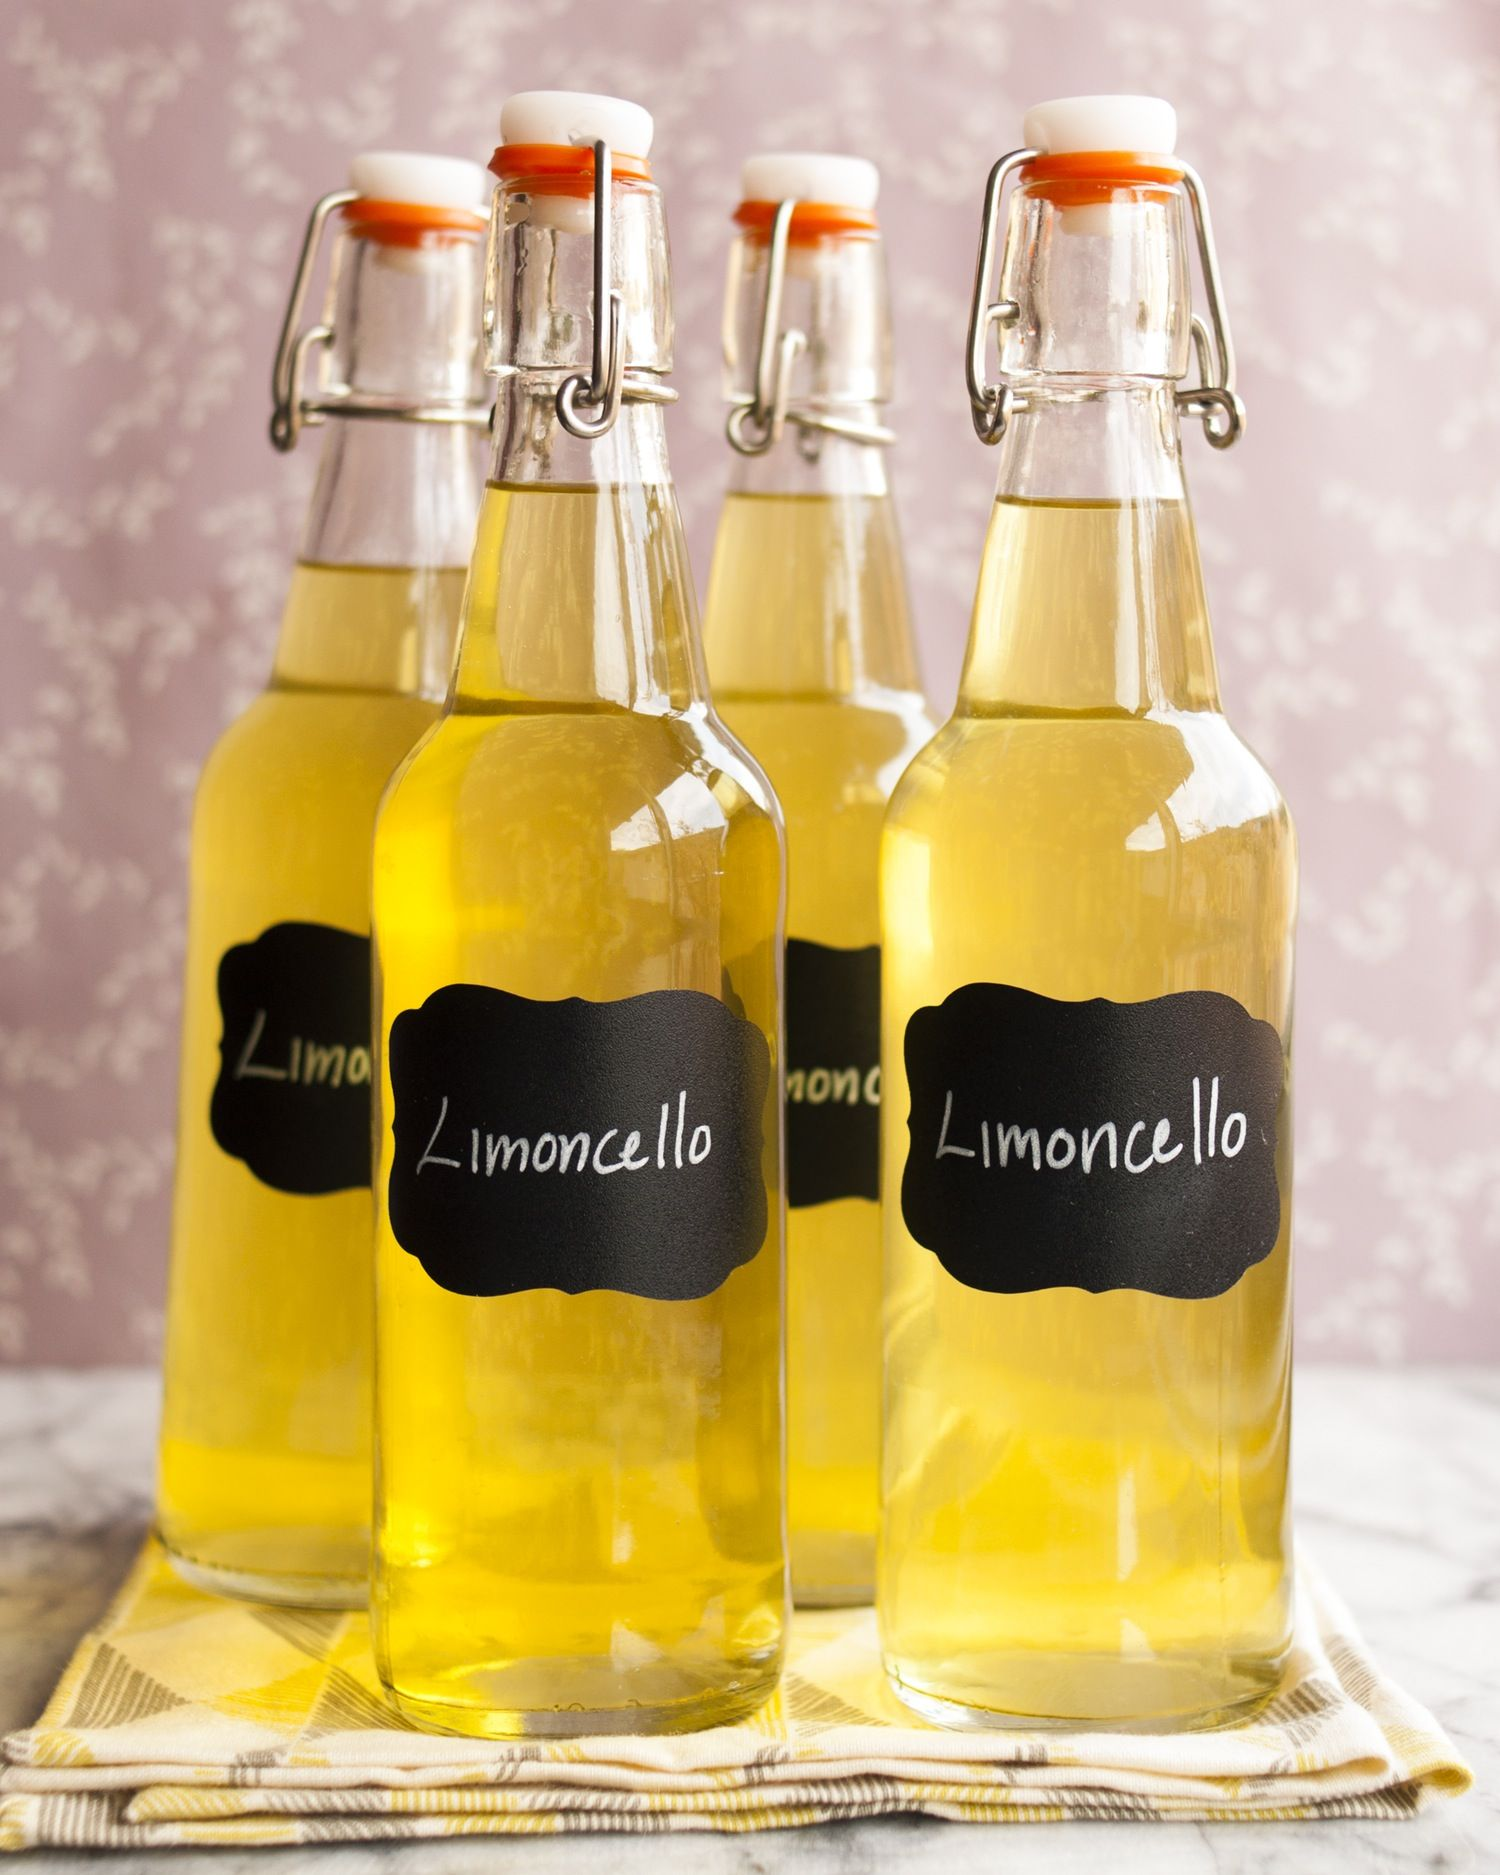 Limoncello Drinks: How To Make Limoncello